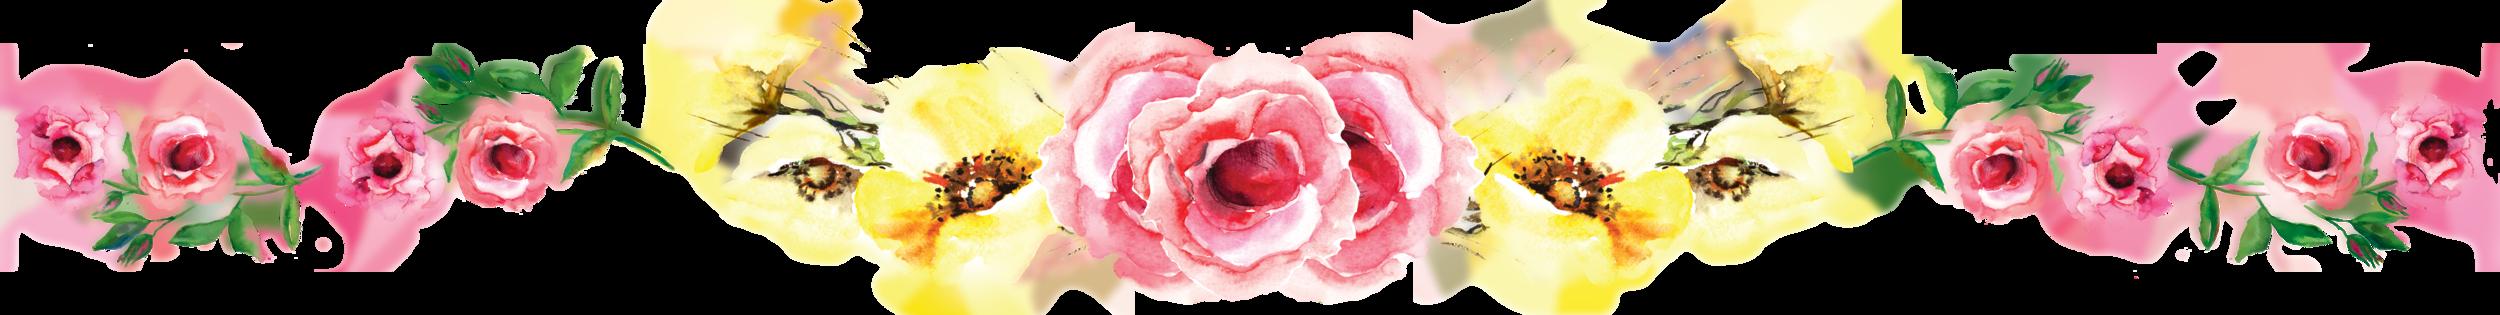 rose meadowfoam chain.png